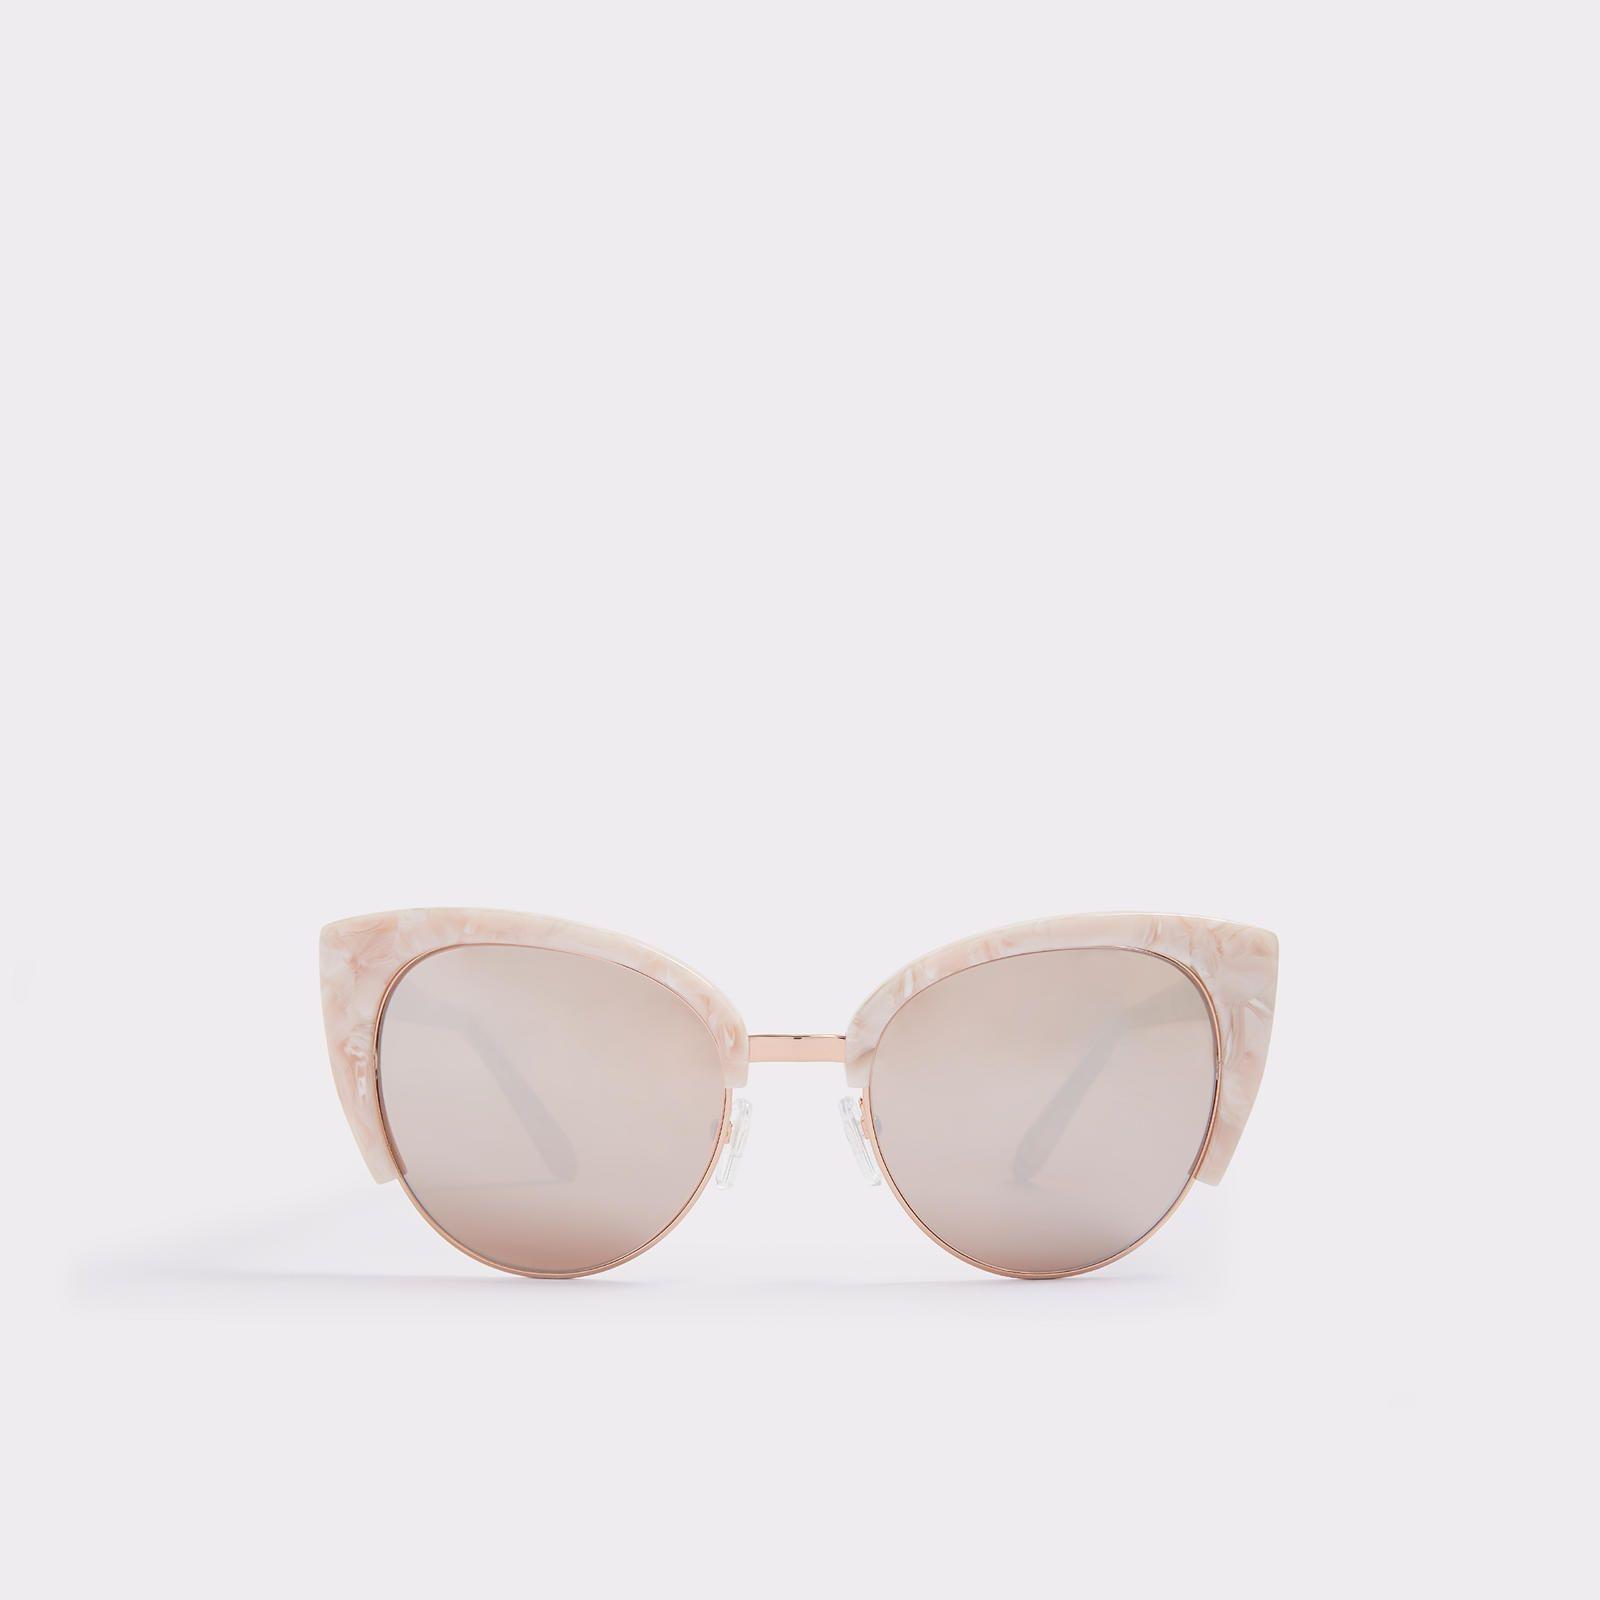 5fcb981cd2e5 Asarewien Beach Accessories, Sunglasses Accessories, Fashion Accessories,  Fashion Jewelry, Fashion Necklace,